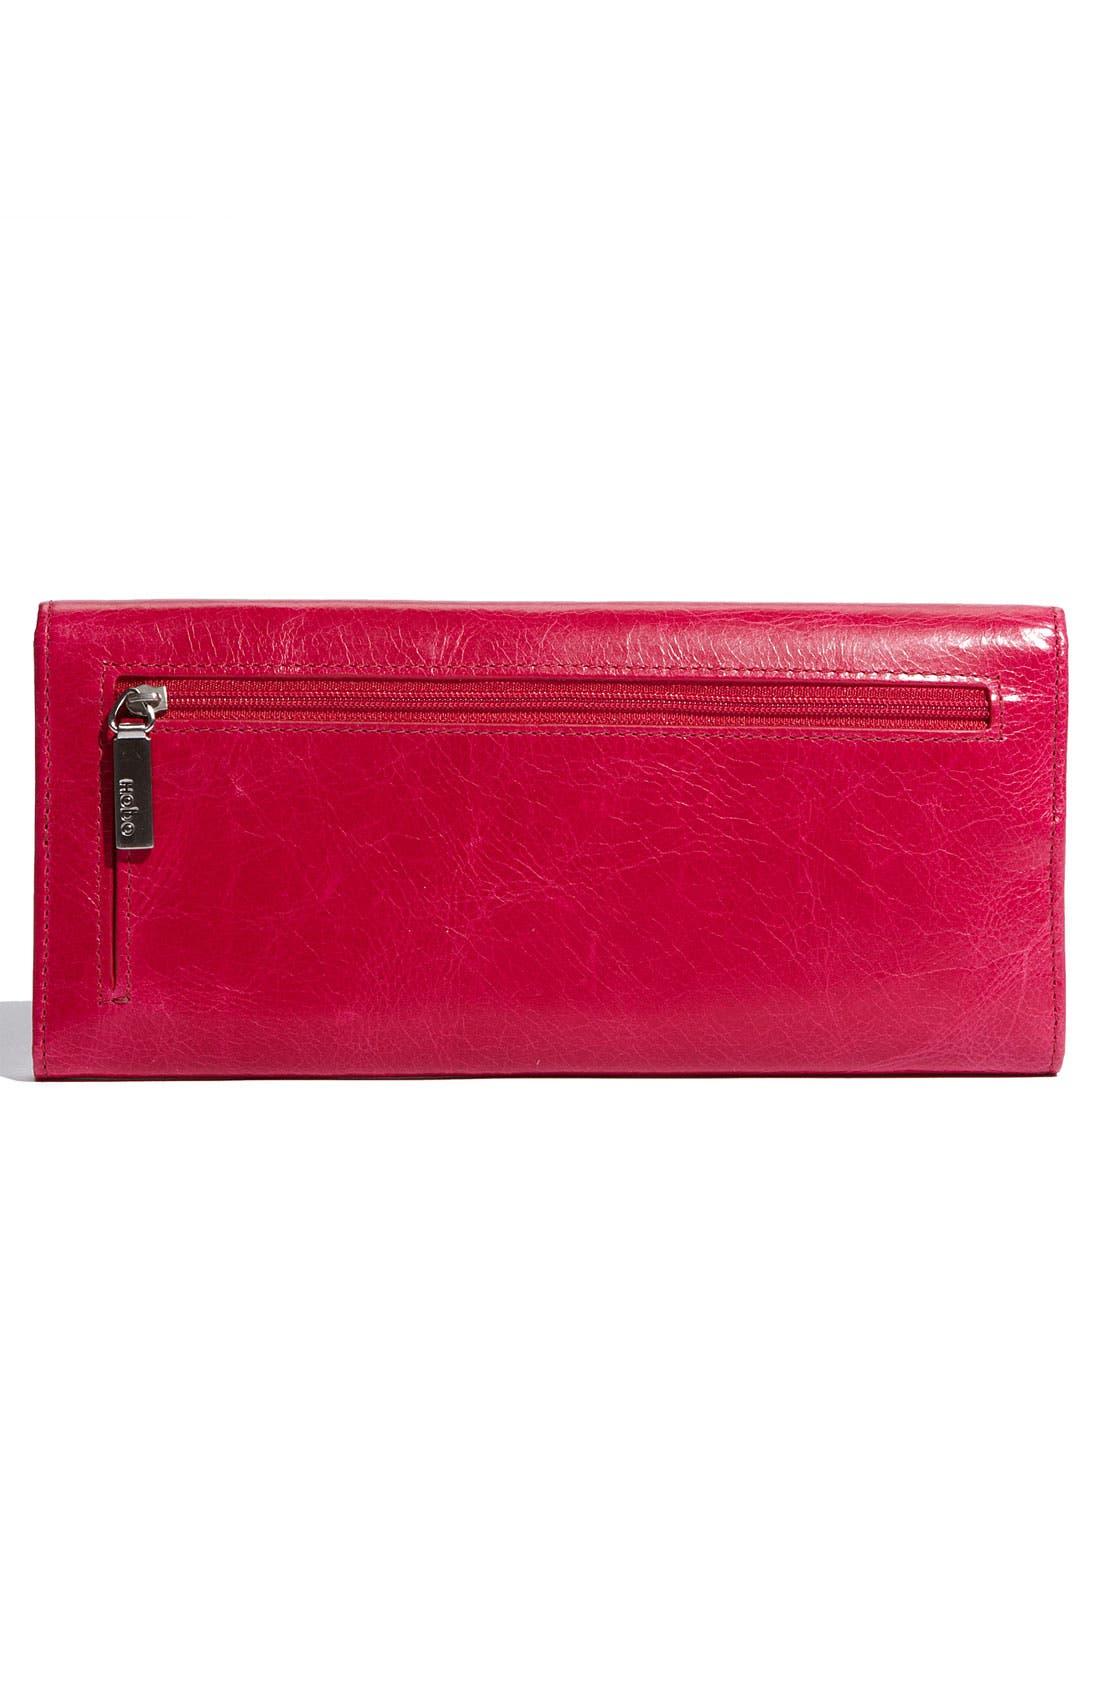 'Sadie' Leather Wallet,                             Alternate thumbnail 133, color,